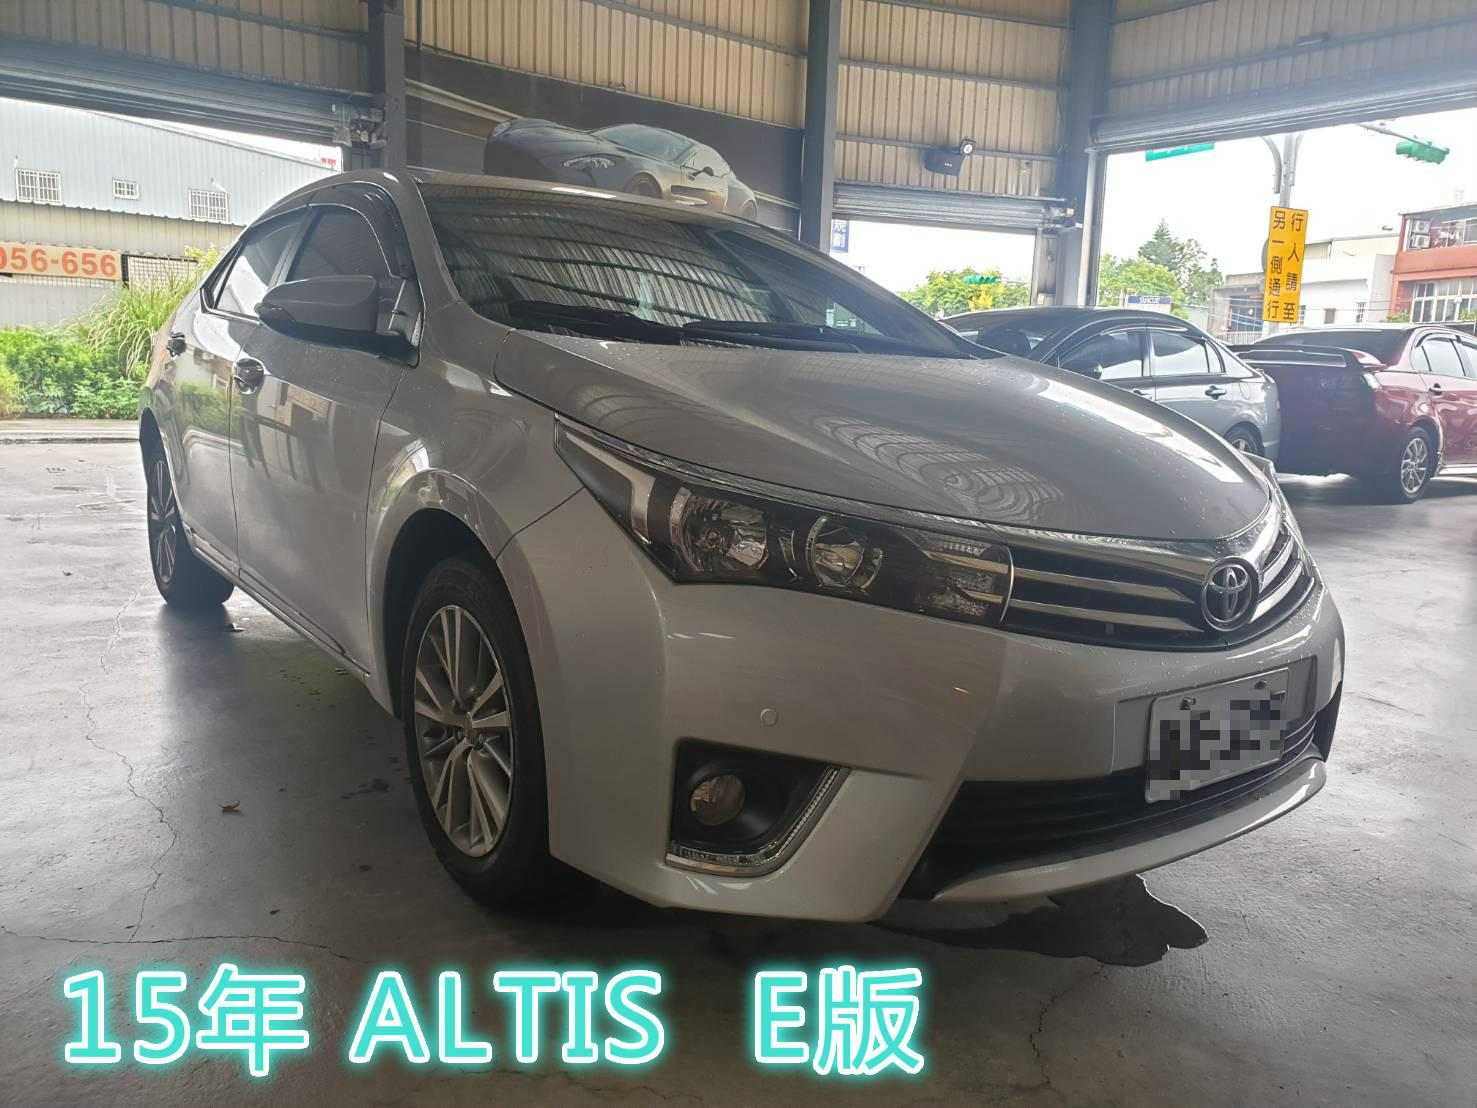 ALTIS E版 只跑6千 全額貸 低利率 找錢 車換車 皆可辦理